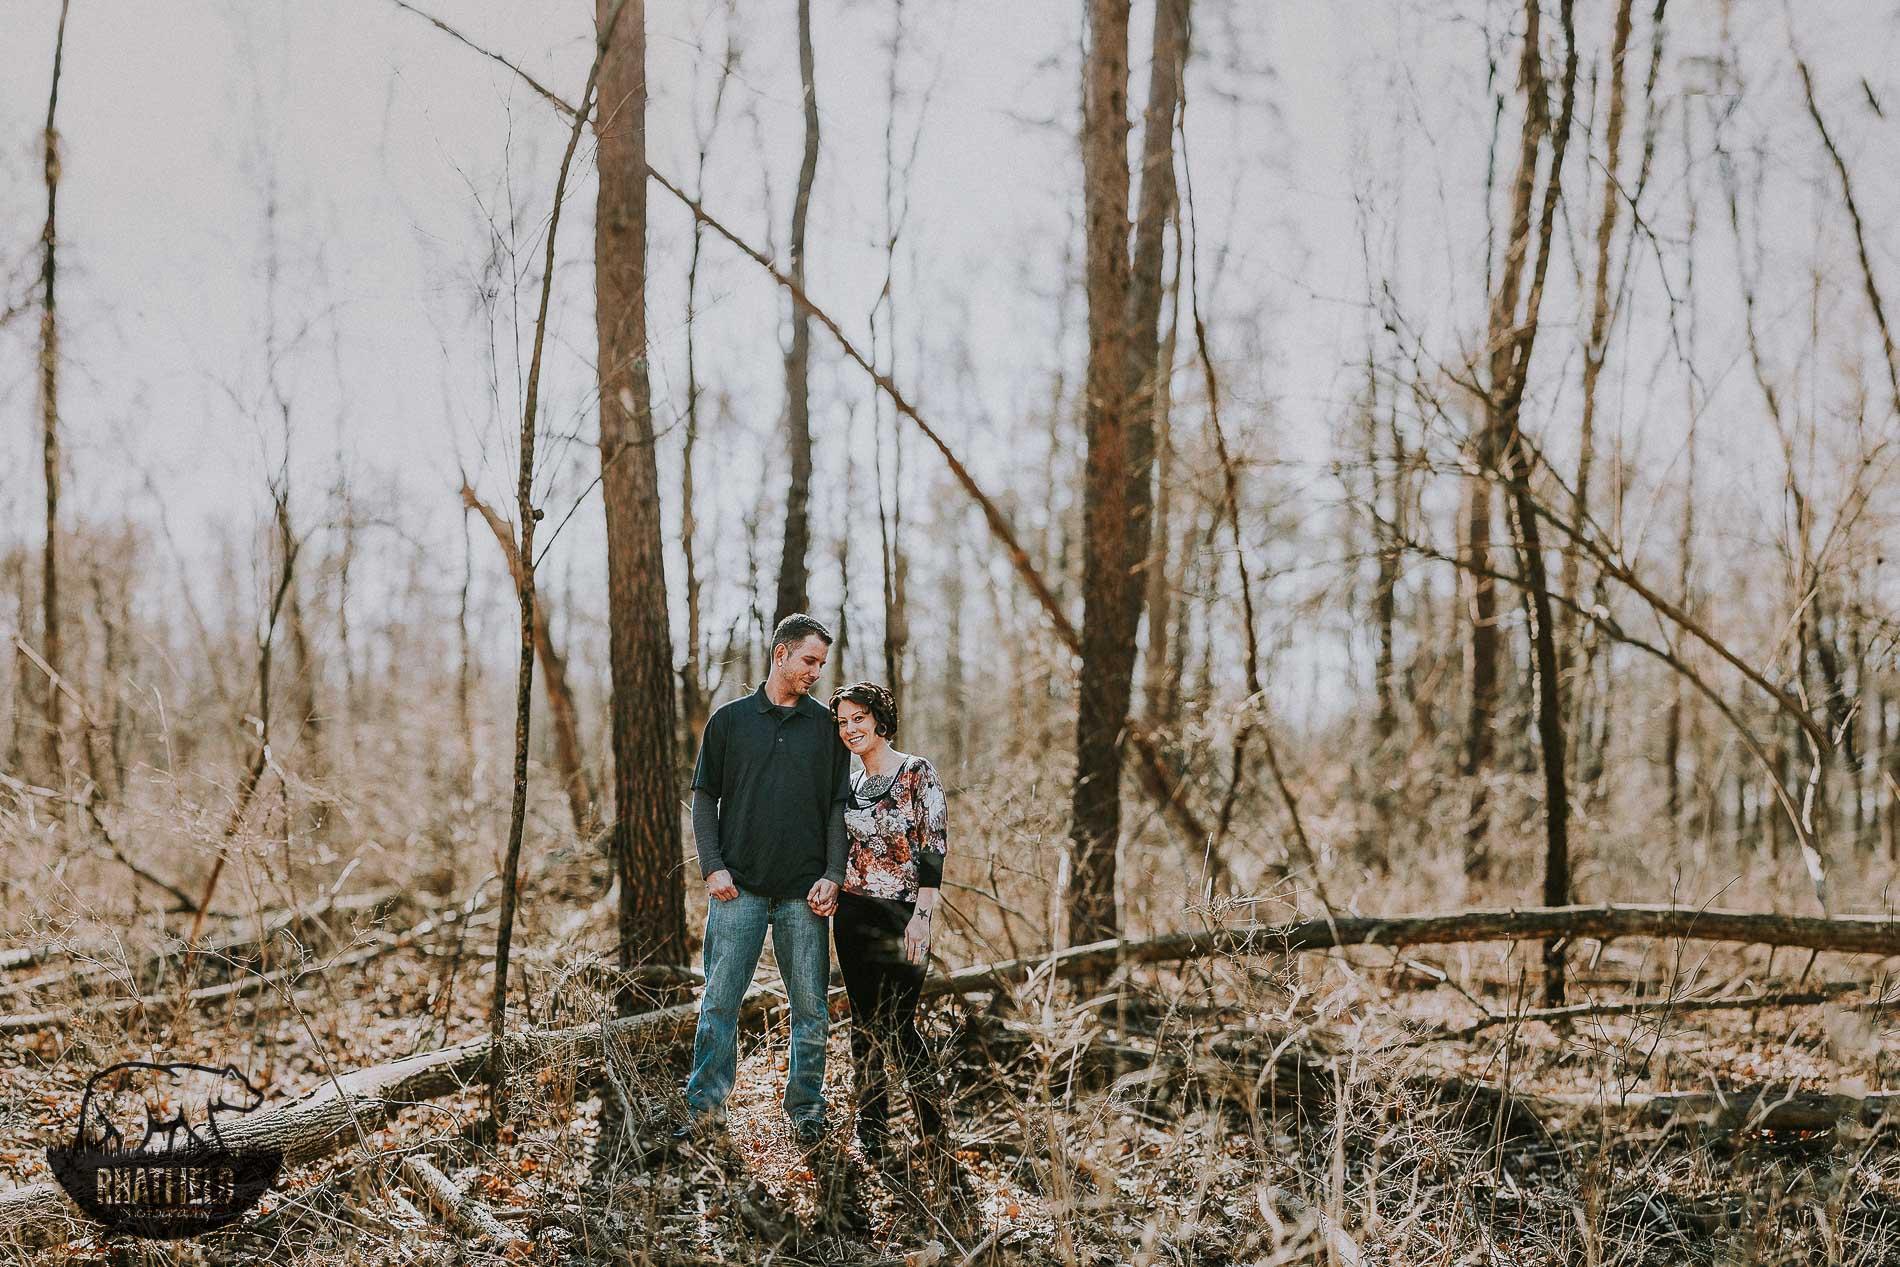 Anthony & Ashley Eagle Creek State Park Fall Engagements www.RHatfieldPhotography.com